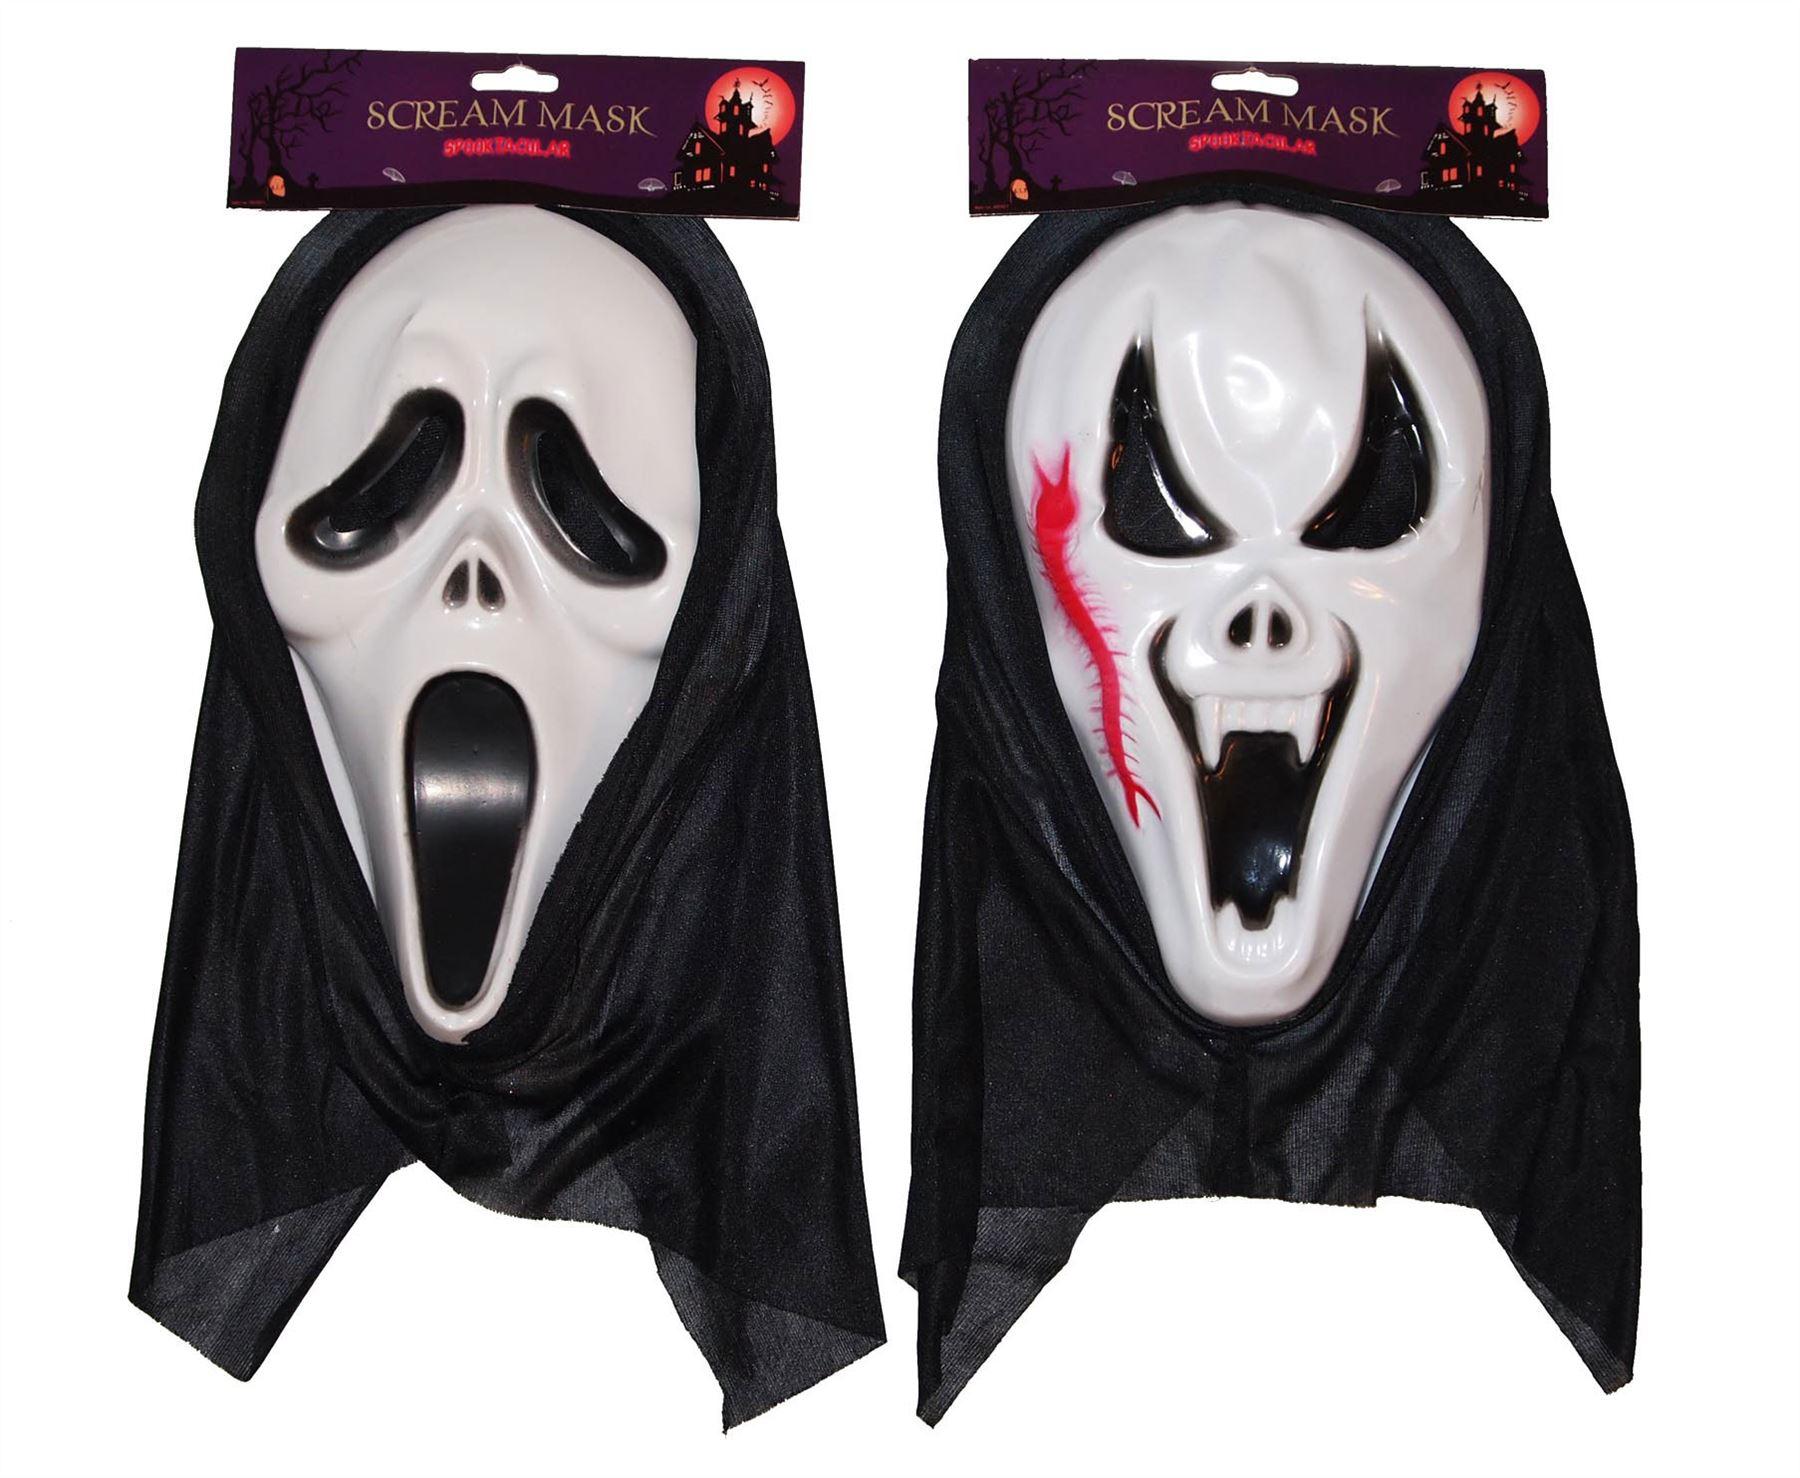 scream dementors zombie mask with hood costume fancy dress halloween outfit